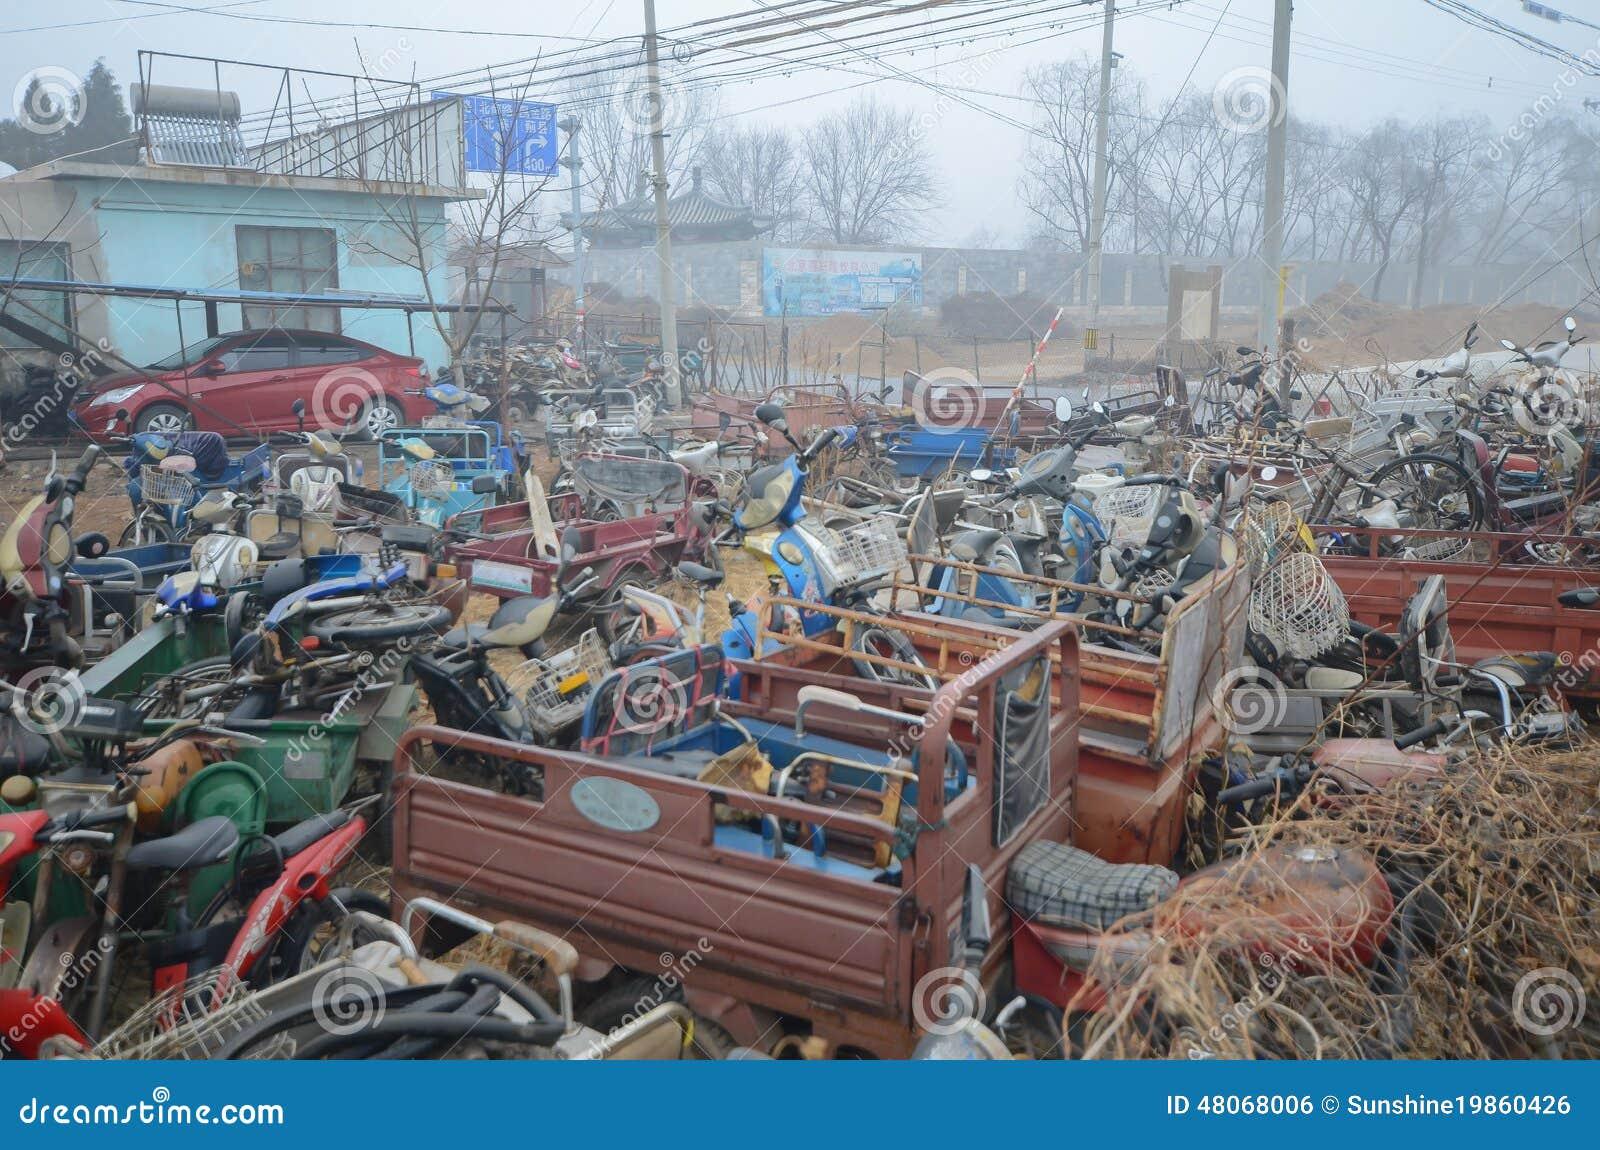 Download Abandoned vehicles stock photo. Image of front, damage - 48068006